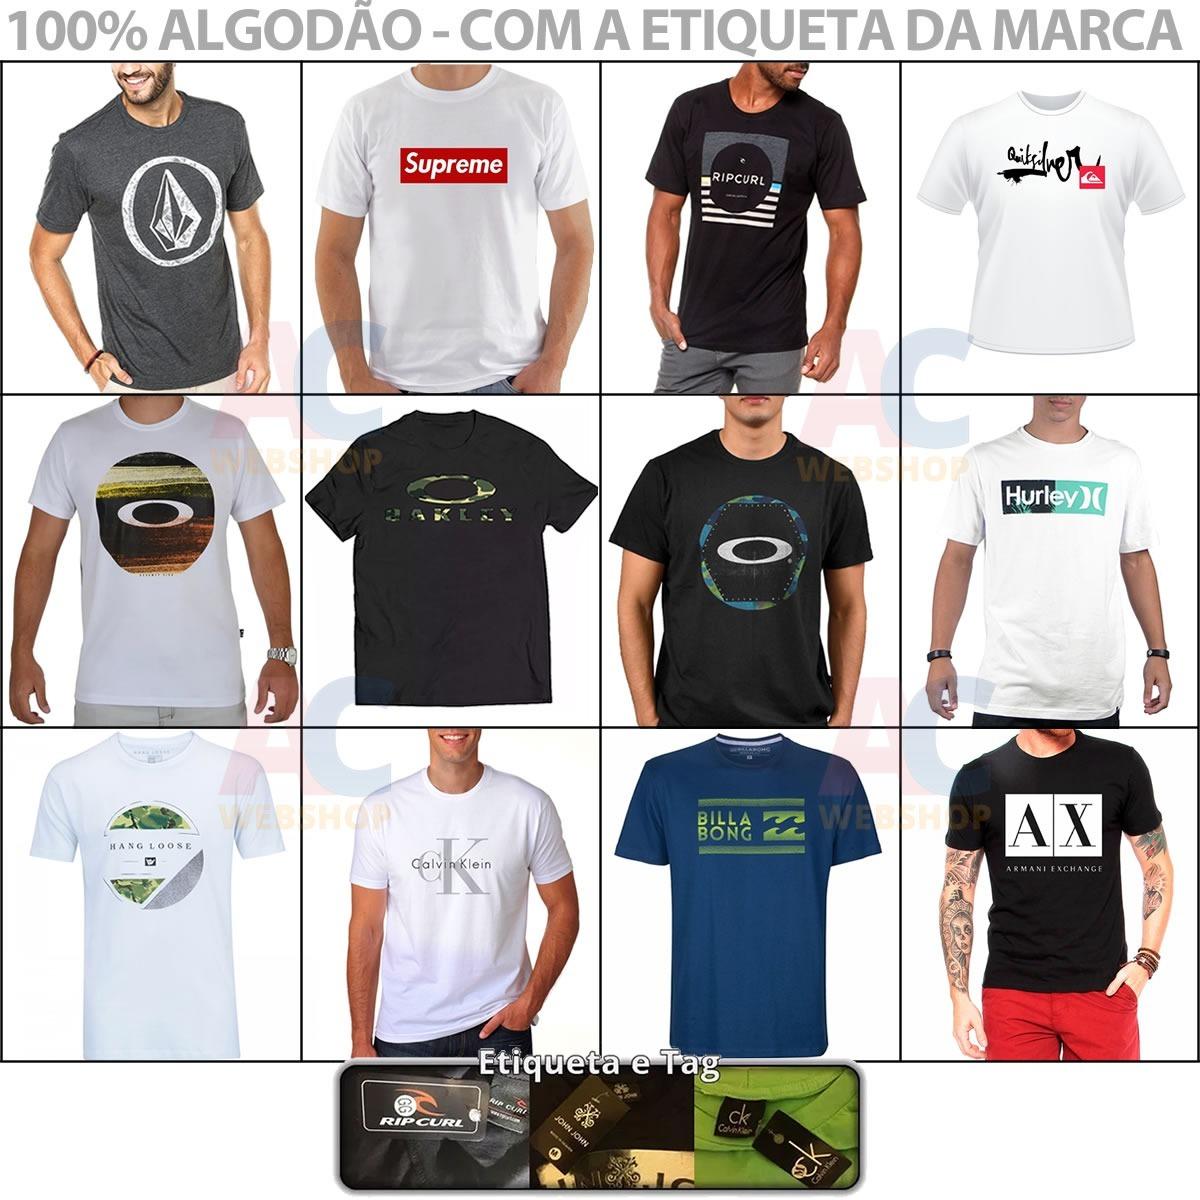 Kit 09 Camiseta Camisa Masculina Baratas Marcas Famosas - R  129 14c96340f0065